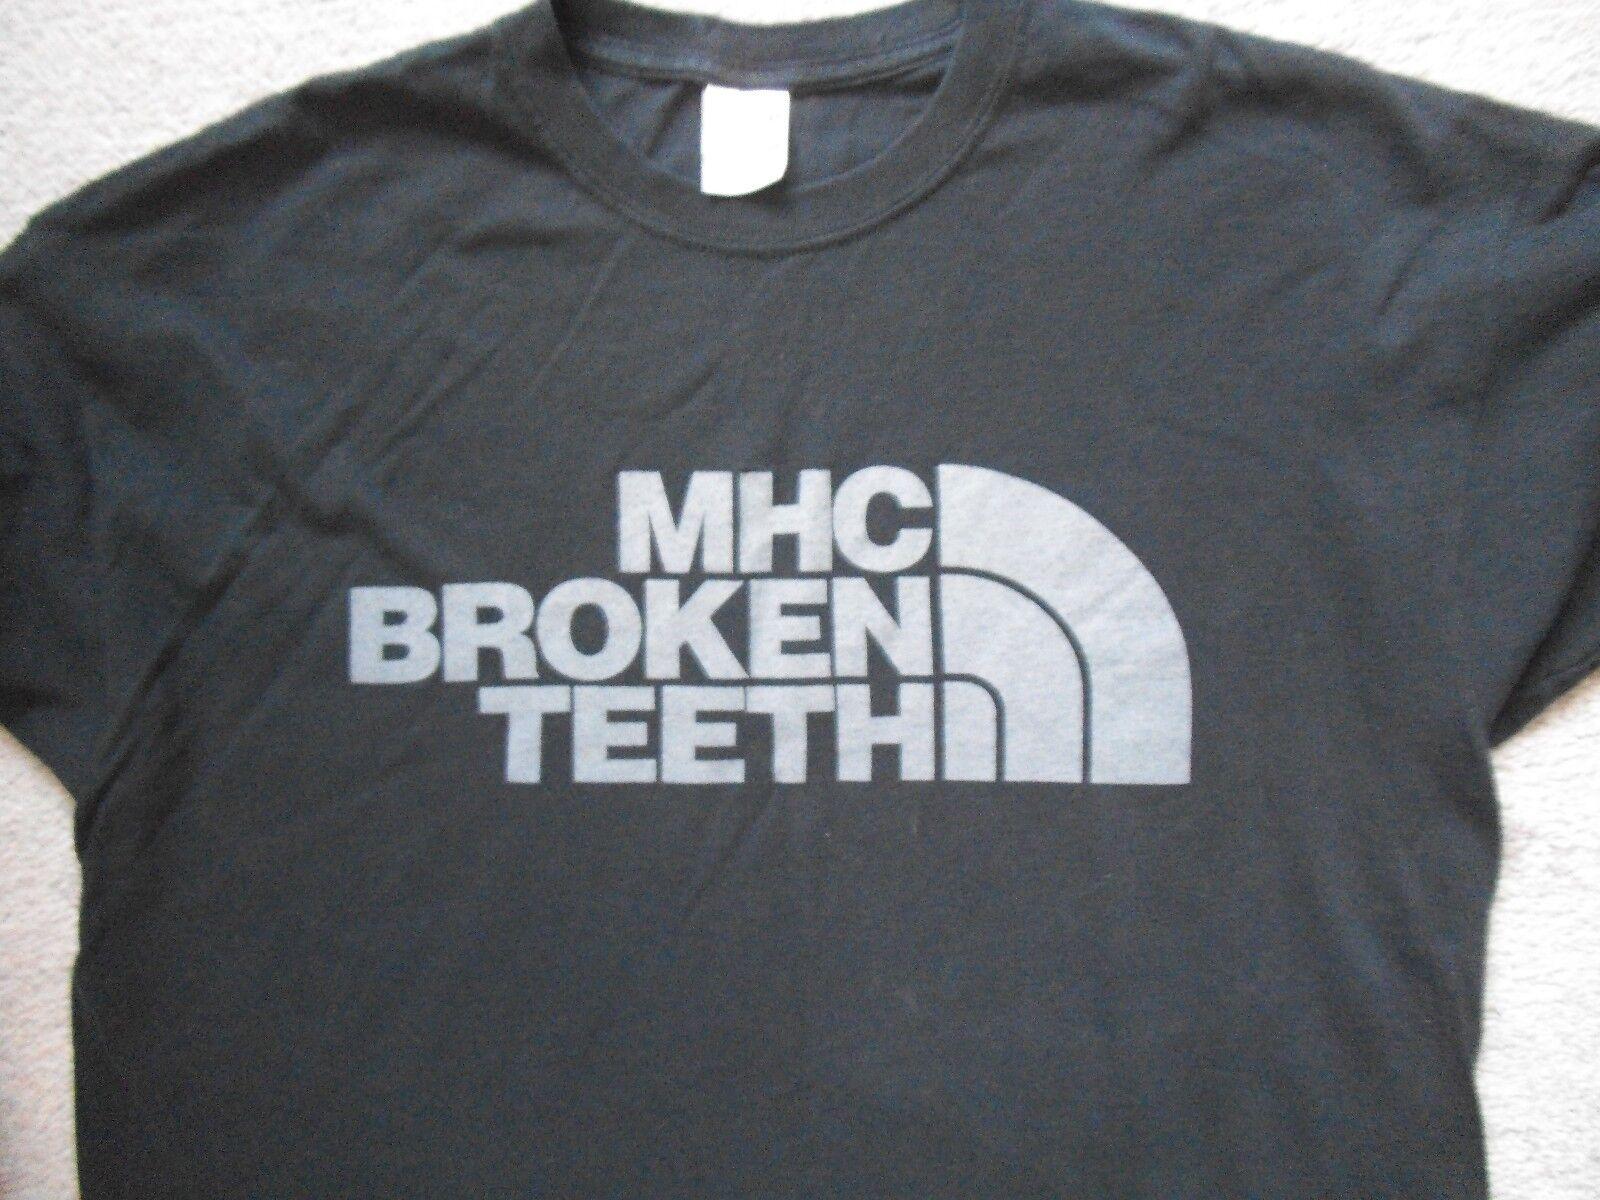 BROKEN TEETH MHC North Face rip T shirt Größe XL sxe hxc ukhc rare xrepentancex